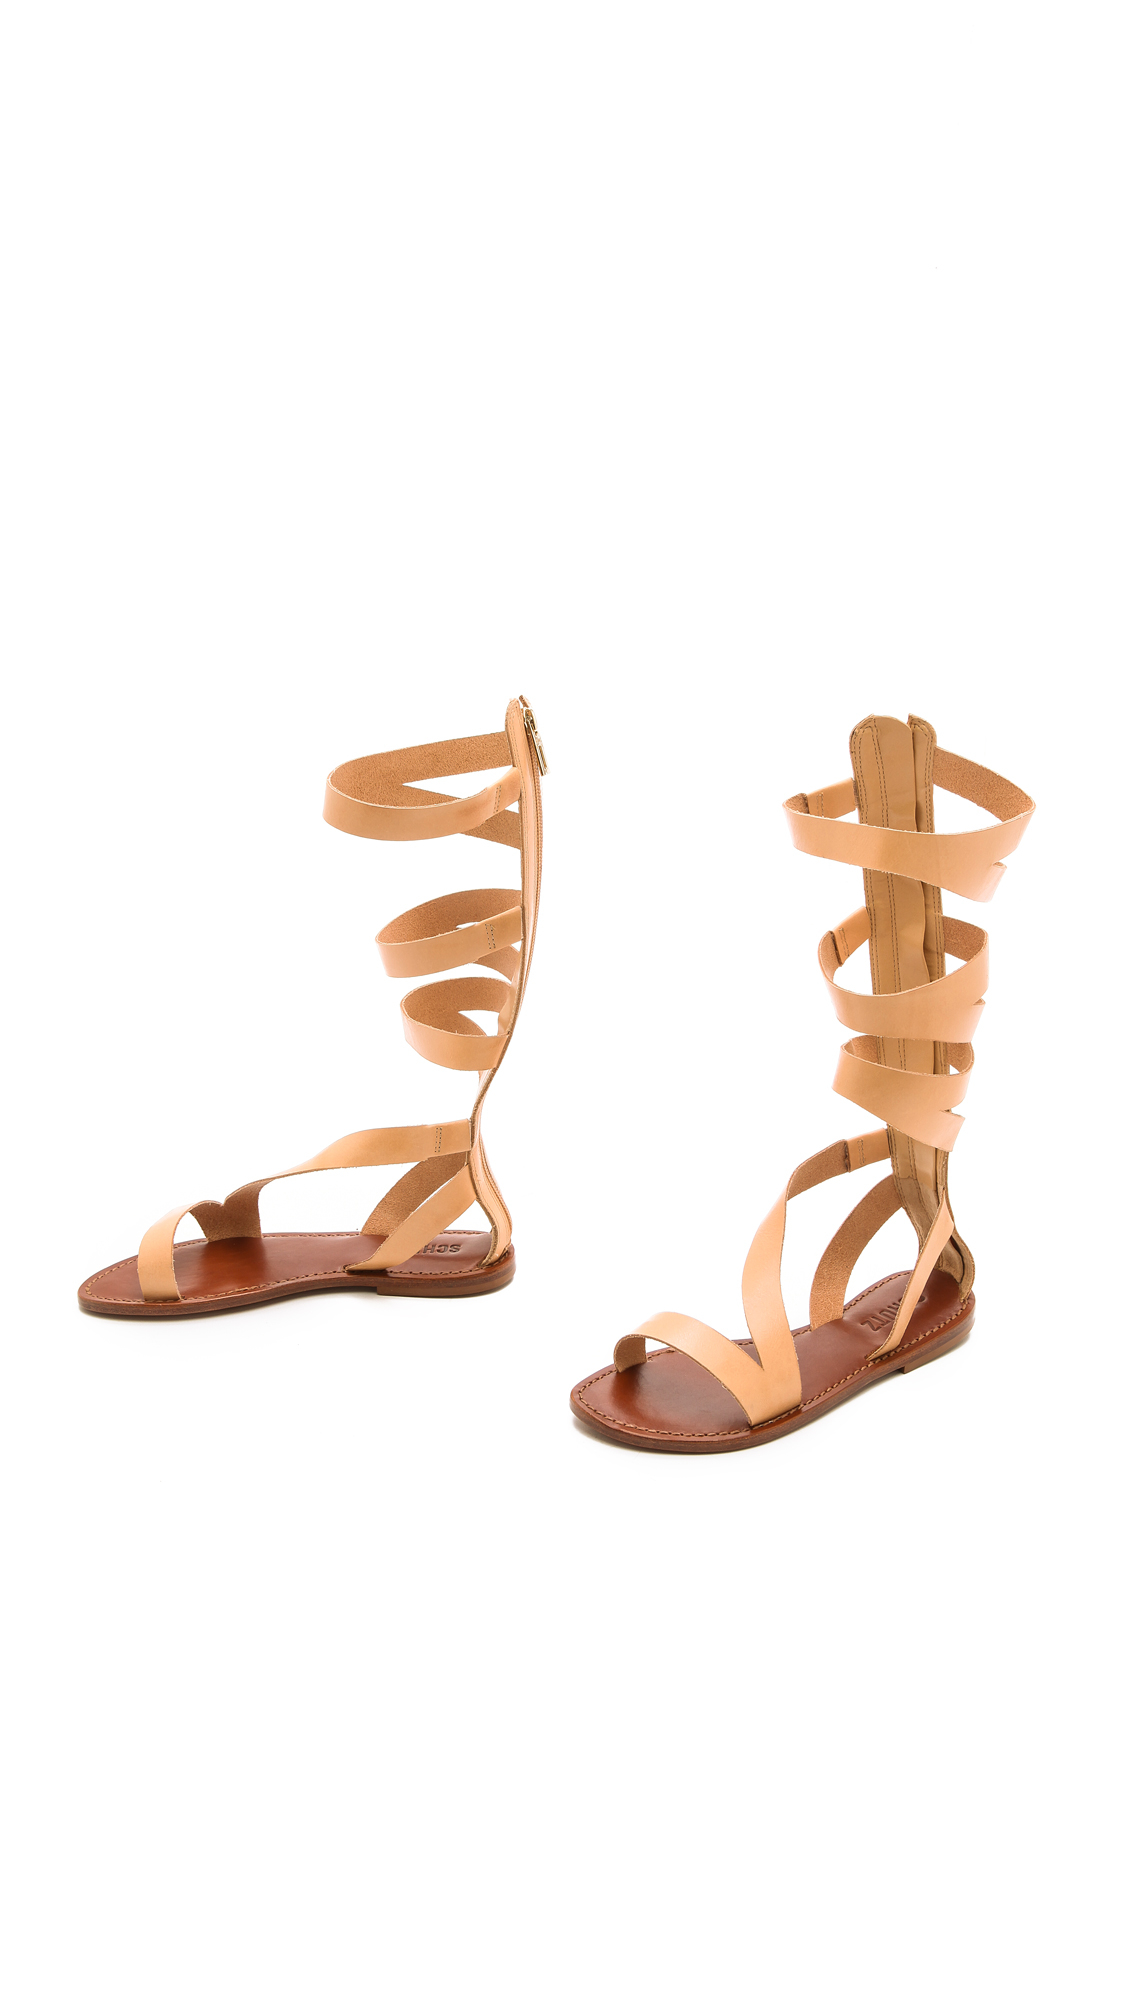 4aa0a0ff7f4 Lyst - Schutz Bilquis Flat Gladiator Sandals - Tanino in Natural